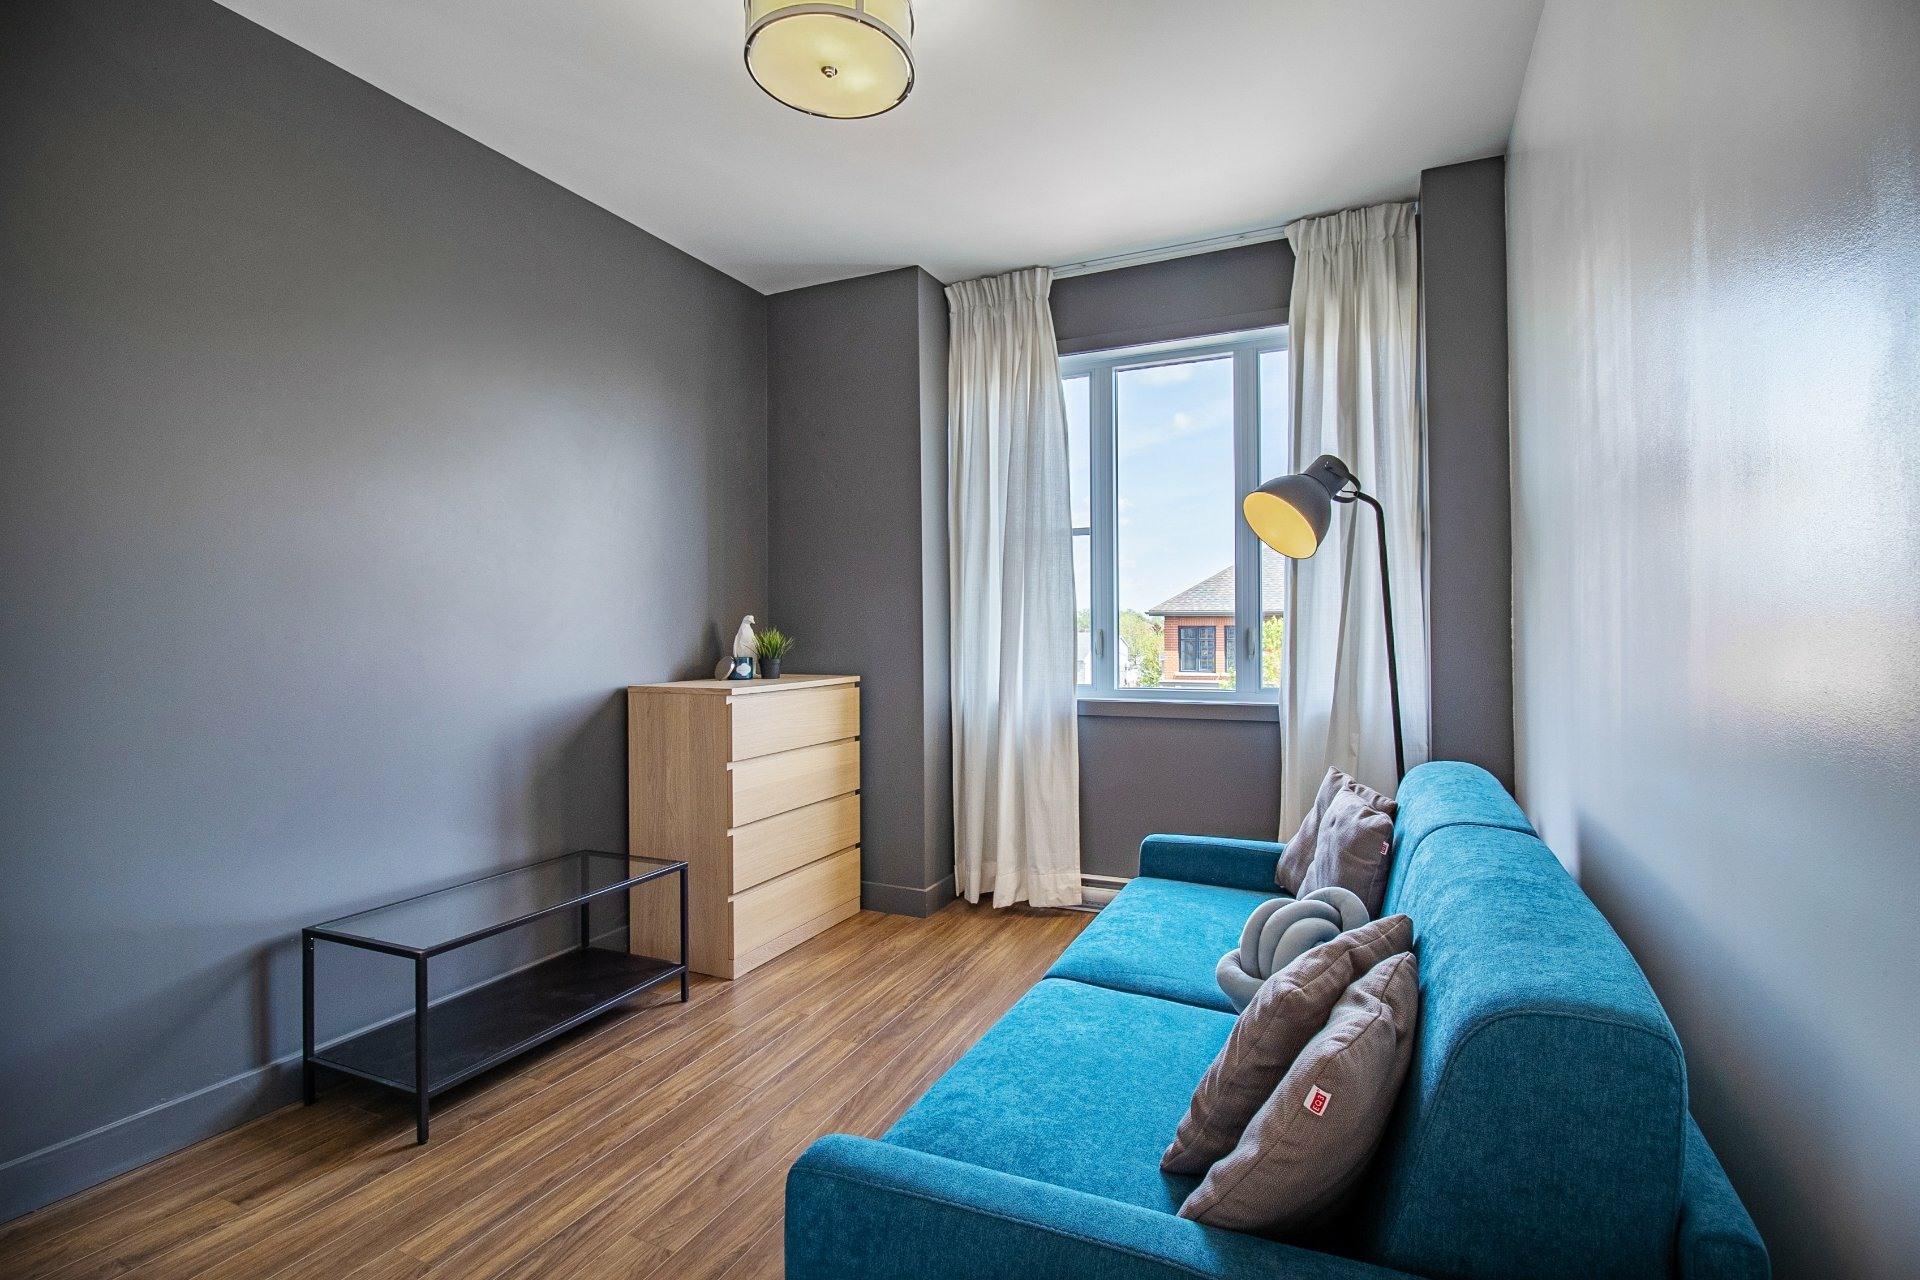 image 19 - Apartment For sale Saint-Hubert Longueuil  - 7 rooms